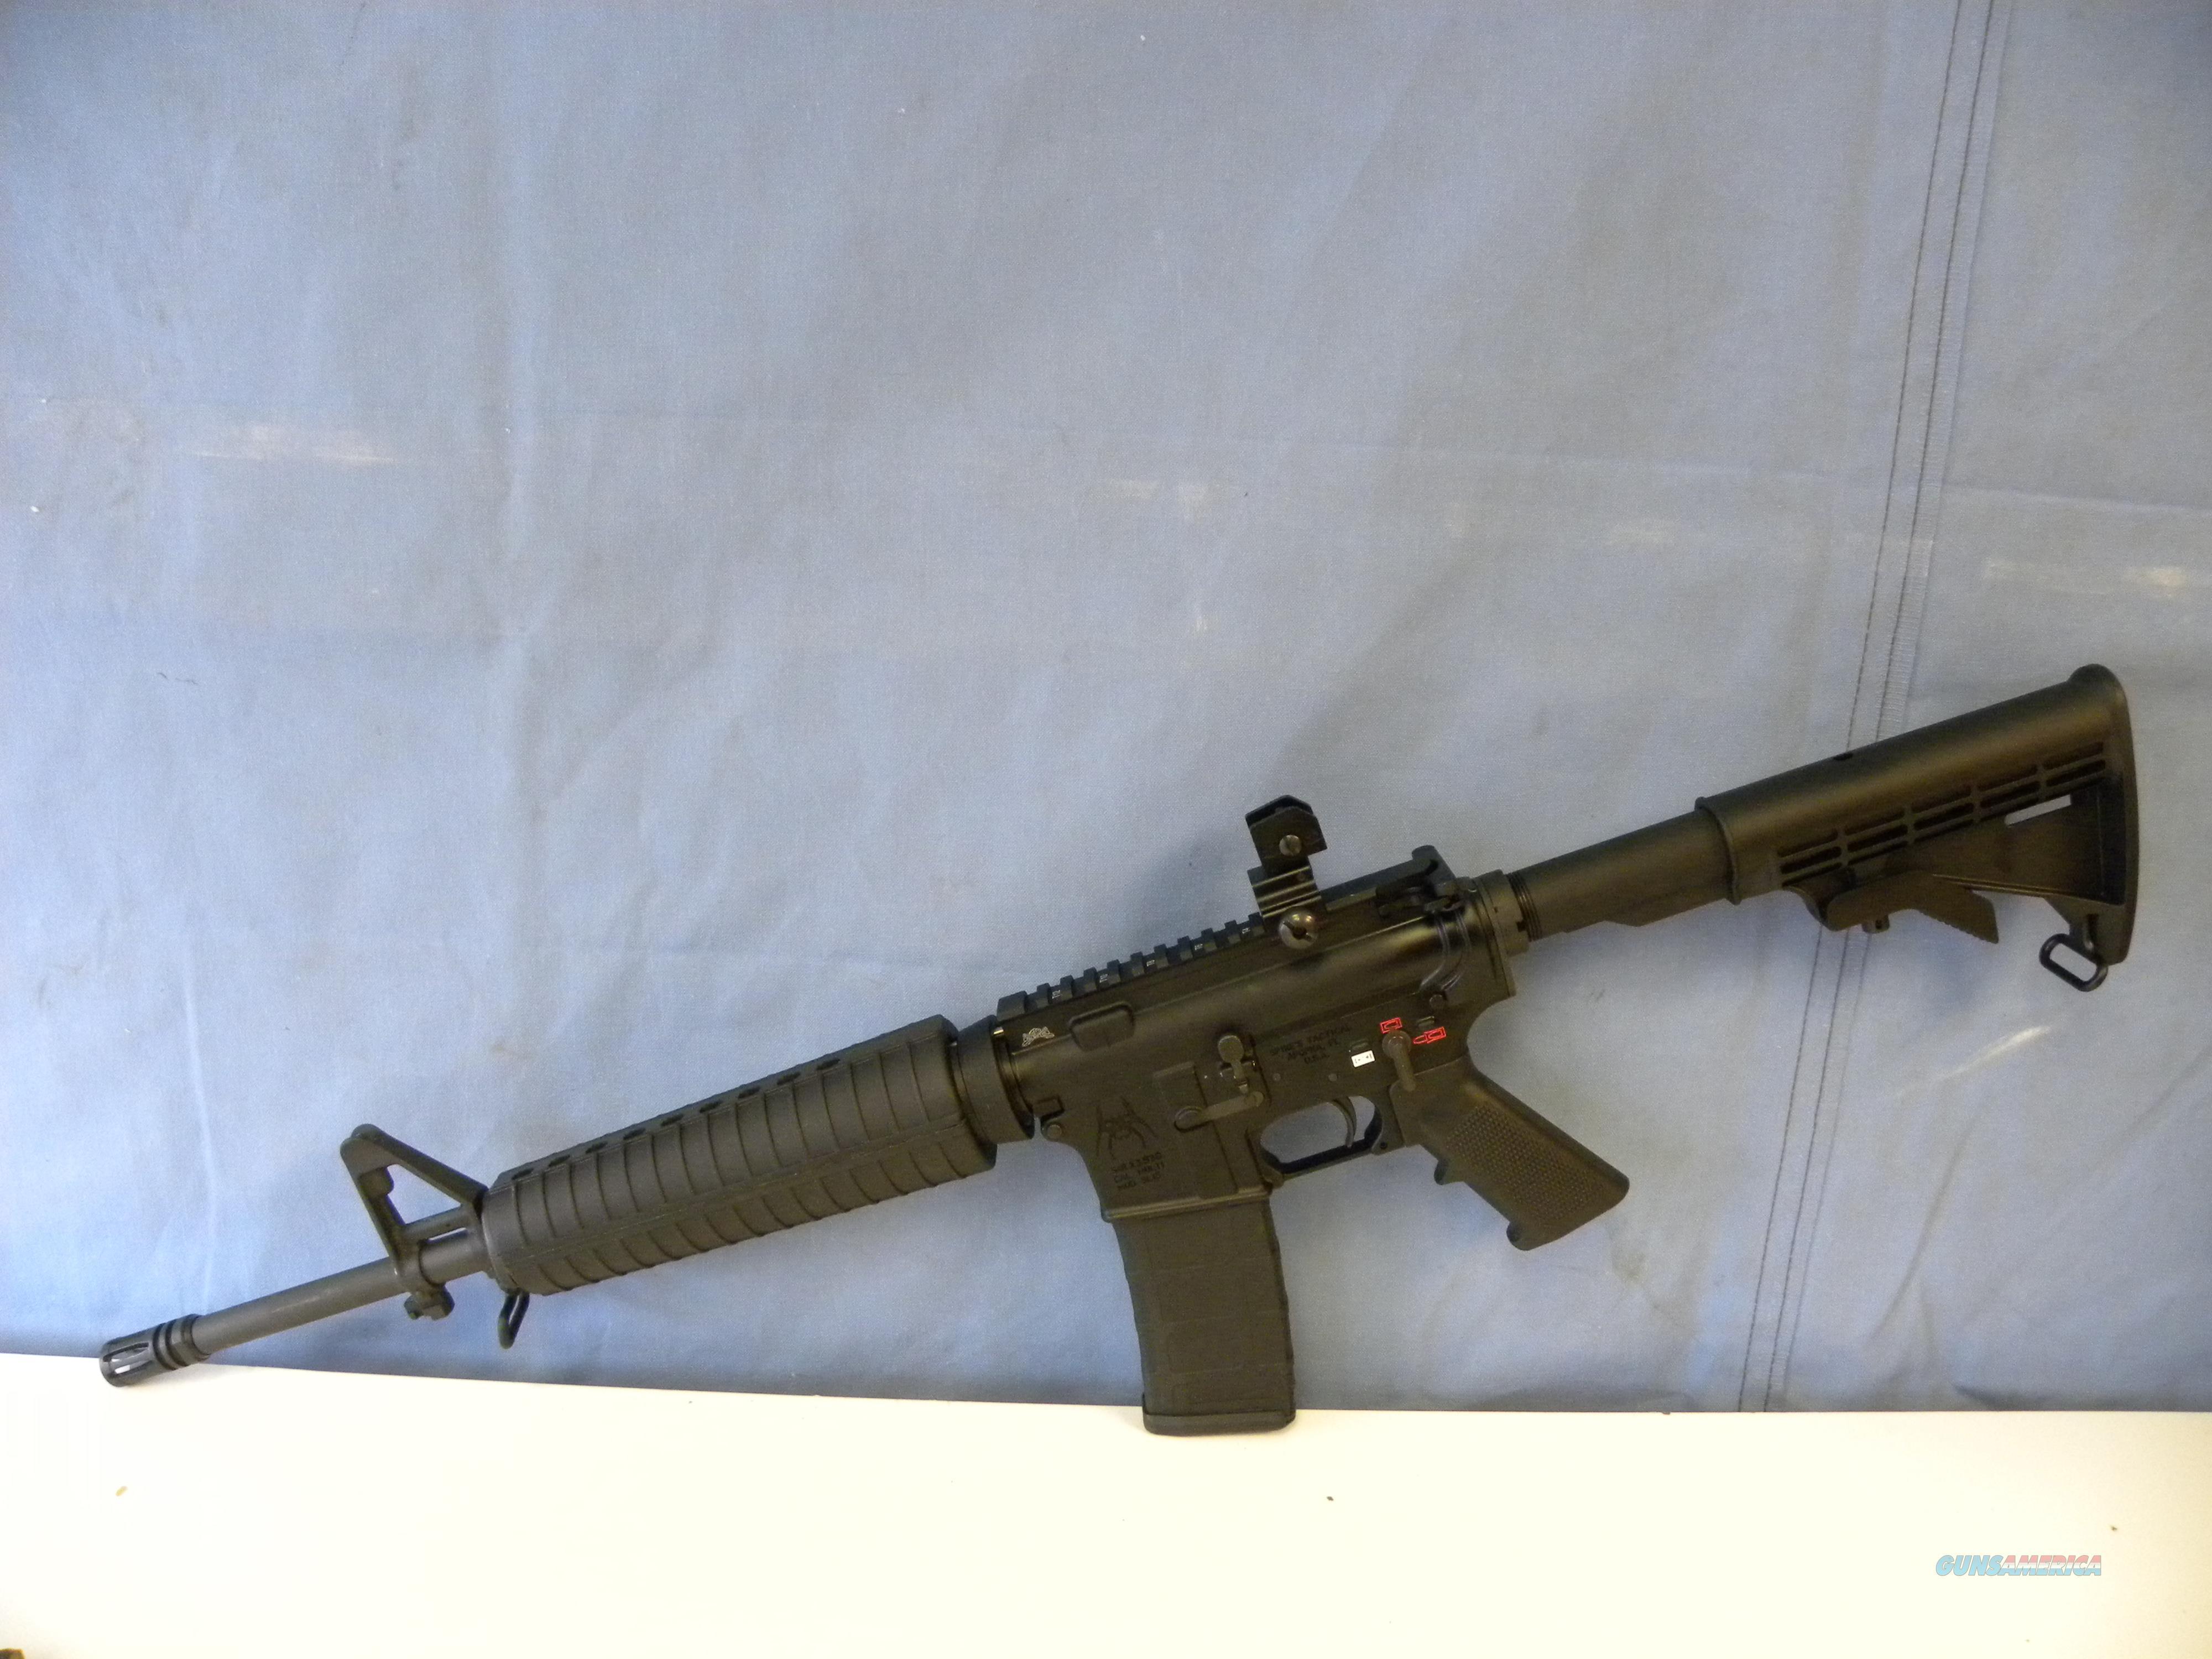 Custom Spikes Tactical AR15  Guns > Rifles > AR-15 Rifles - Small Manufacturers > Complete Rifle